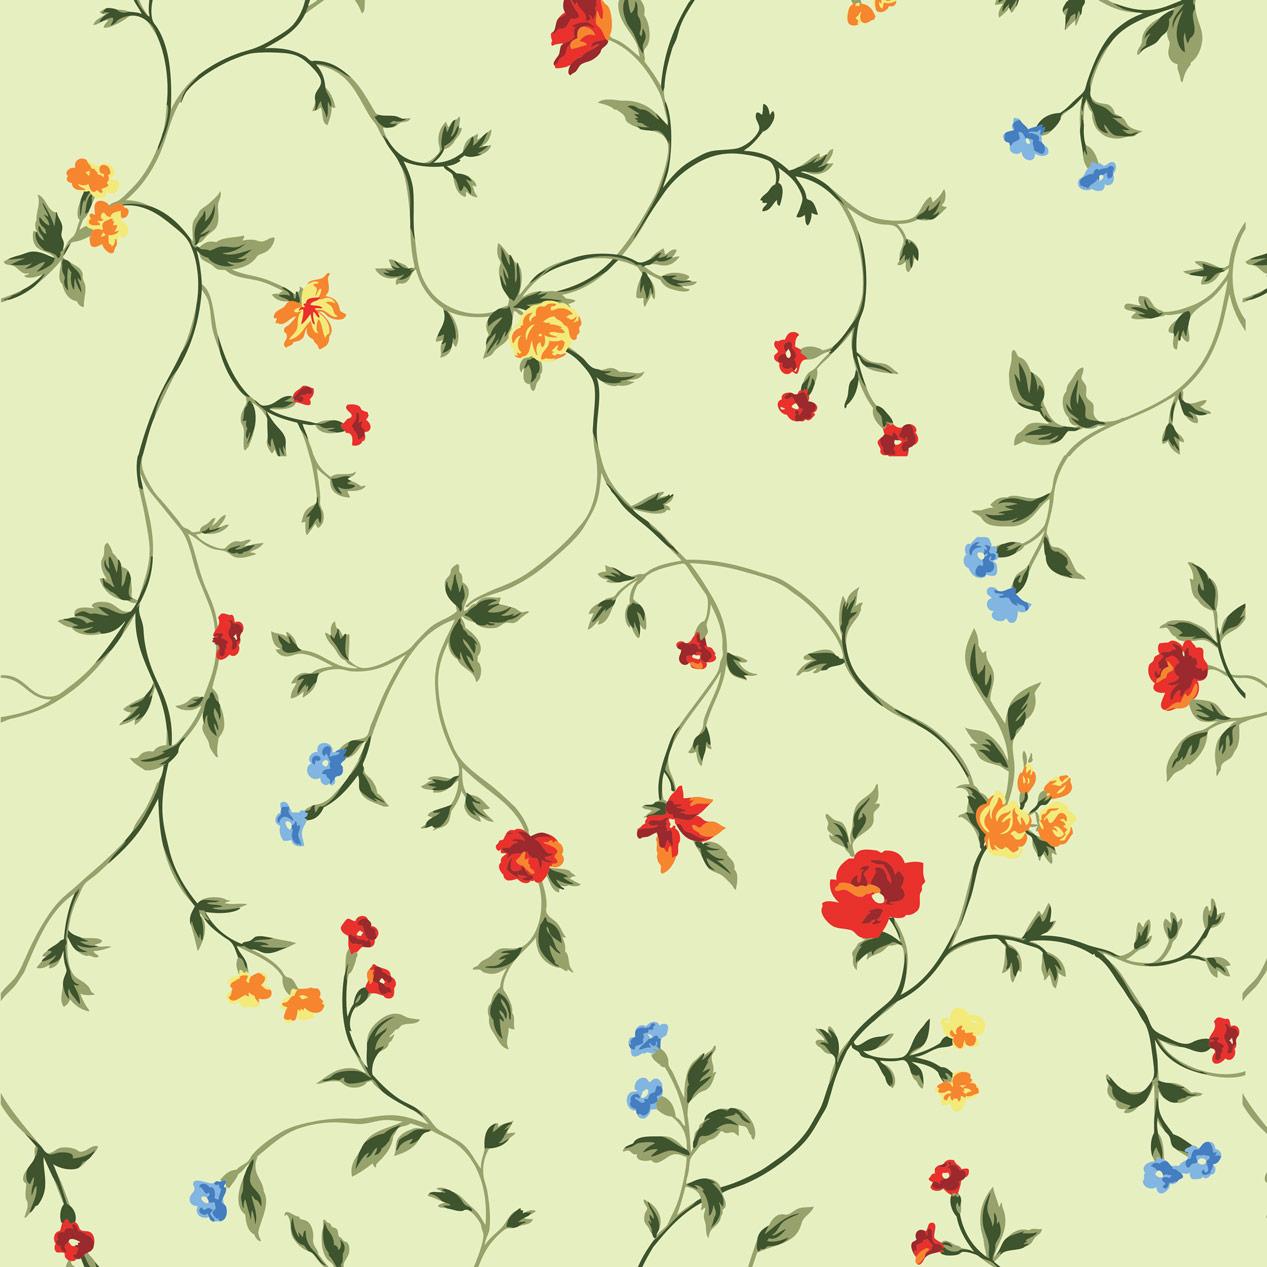 Papel de Parede Floral Colorido Fundo Verde